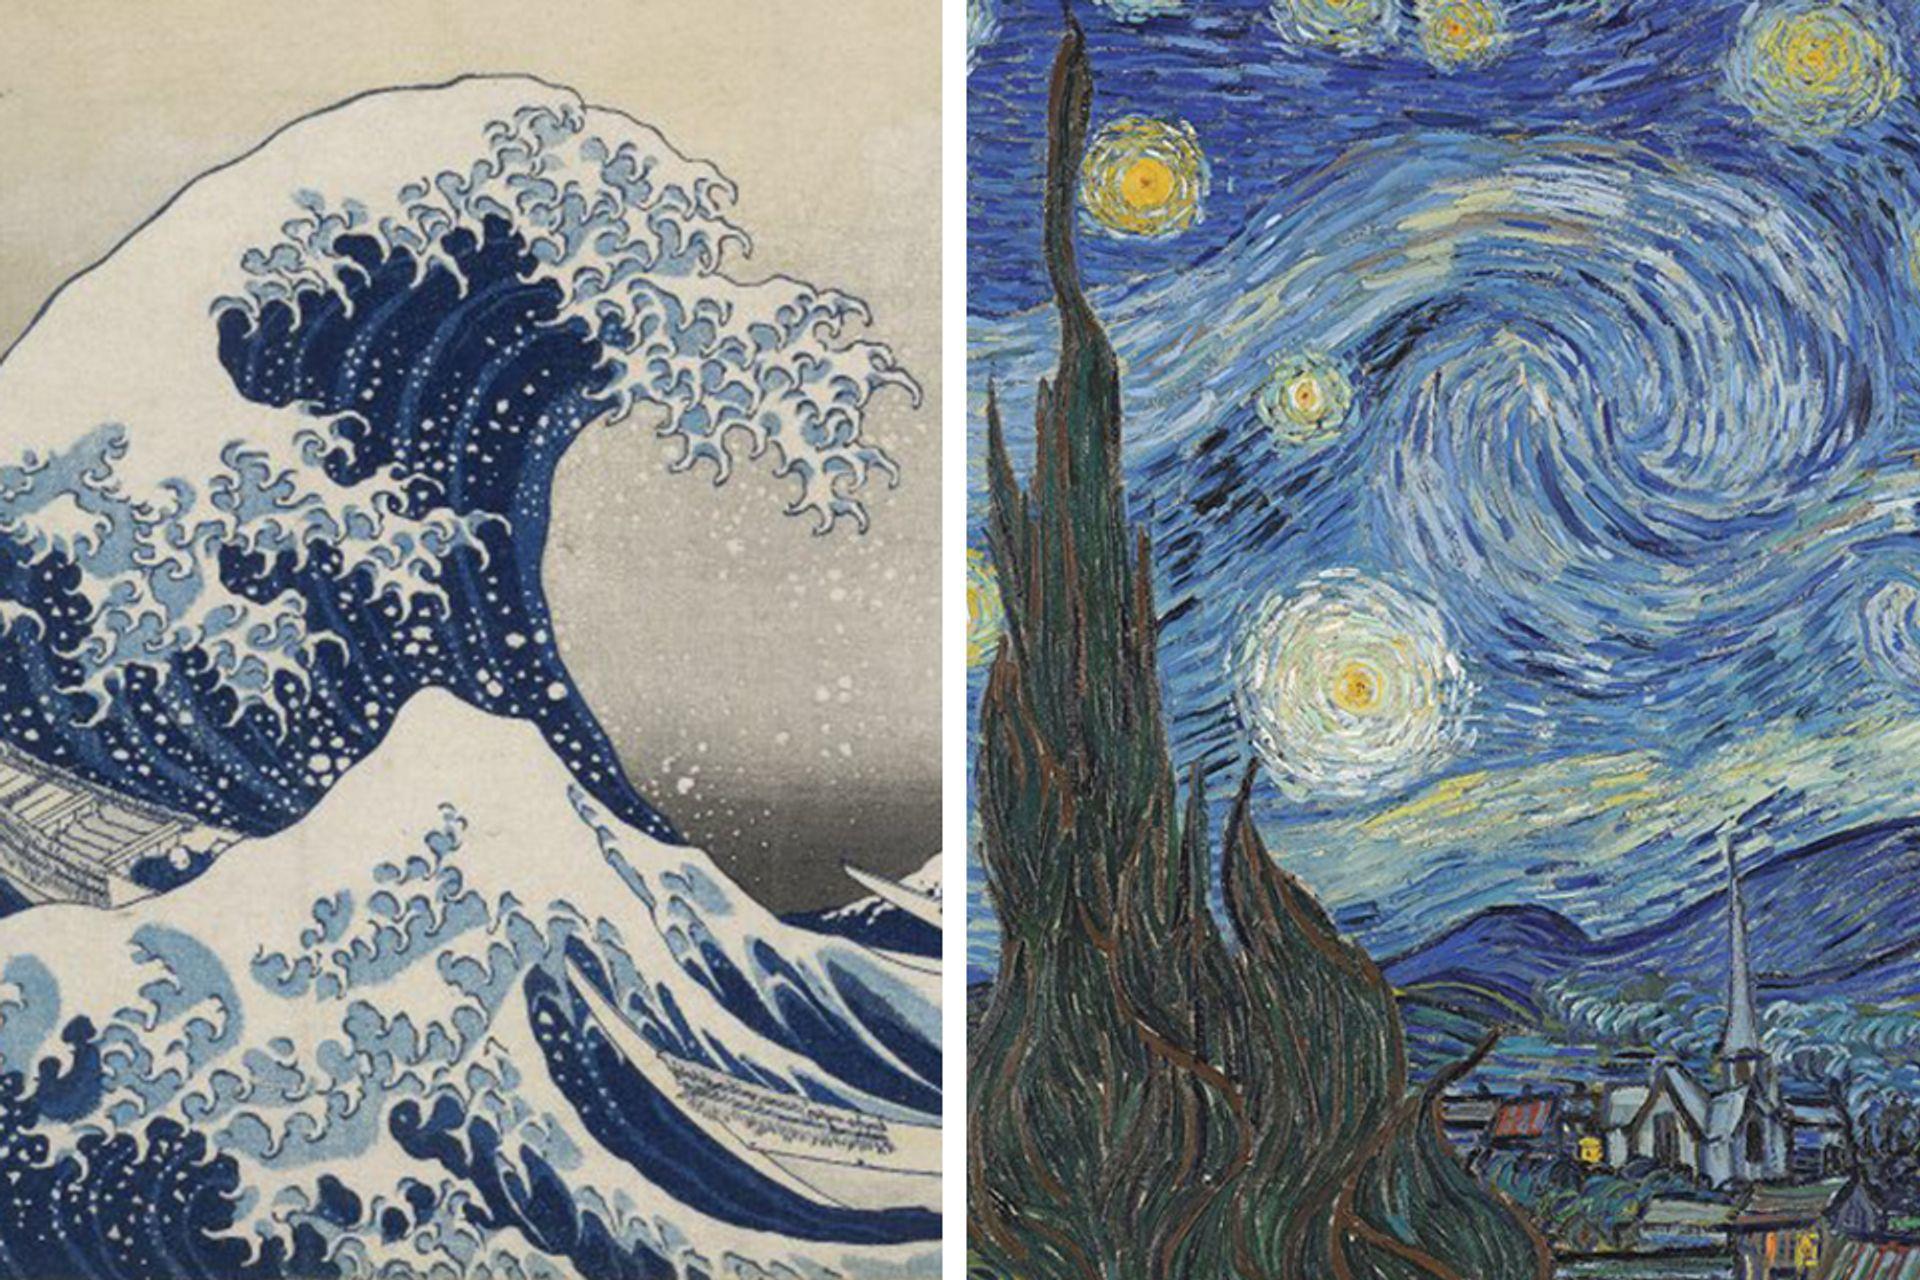 Left: Katsushika Hokusai, The Great Wave, about 1831. Right: Van Gogh, Starry Night, June 1889 Hokusai: © the Trustees of the British Museum, London. Van Gogh: courtesy of the Museum of Modern Art, New York, USA / Bridgeman Images